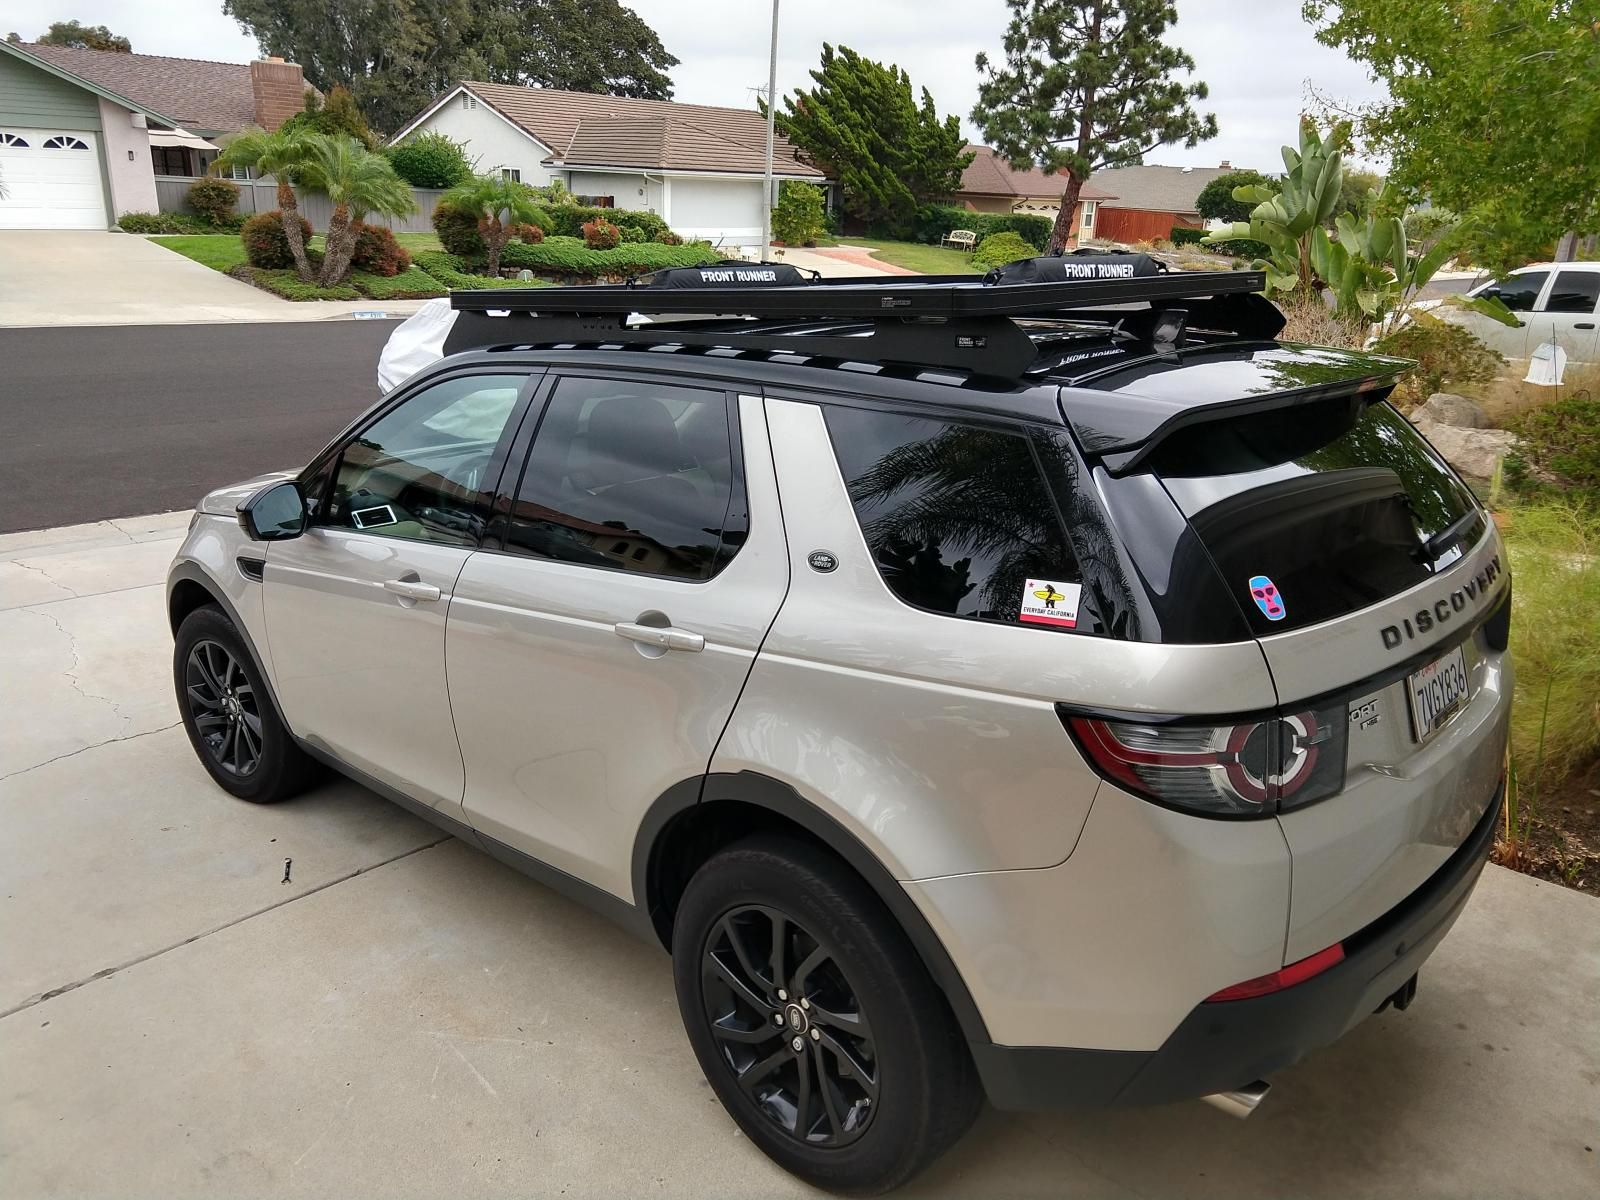 Safari Type Roof Rack For Panoramic Roof Land Rover Discovery Sport Forum Land Rover Discovery Sport Land Rover Land Rover Sport